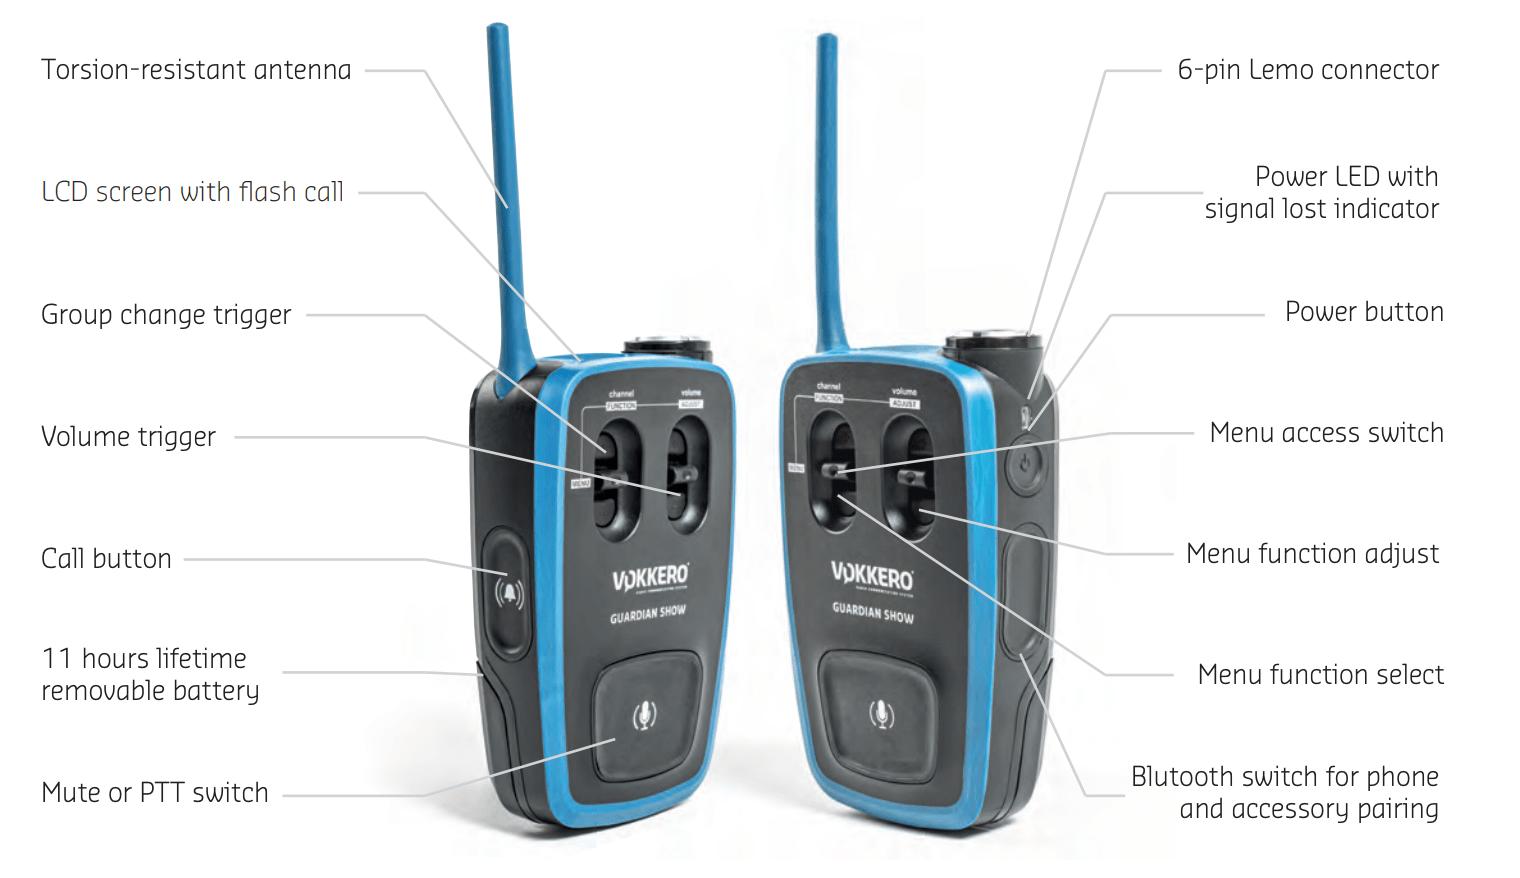 Vokkero Guardian Show - Wireless Full Duplex Intercom System 2